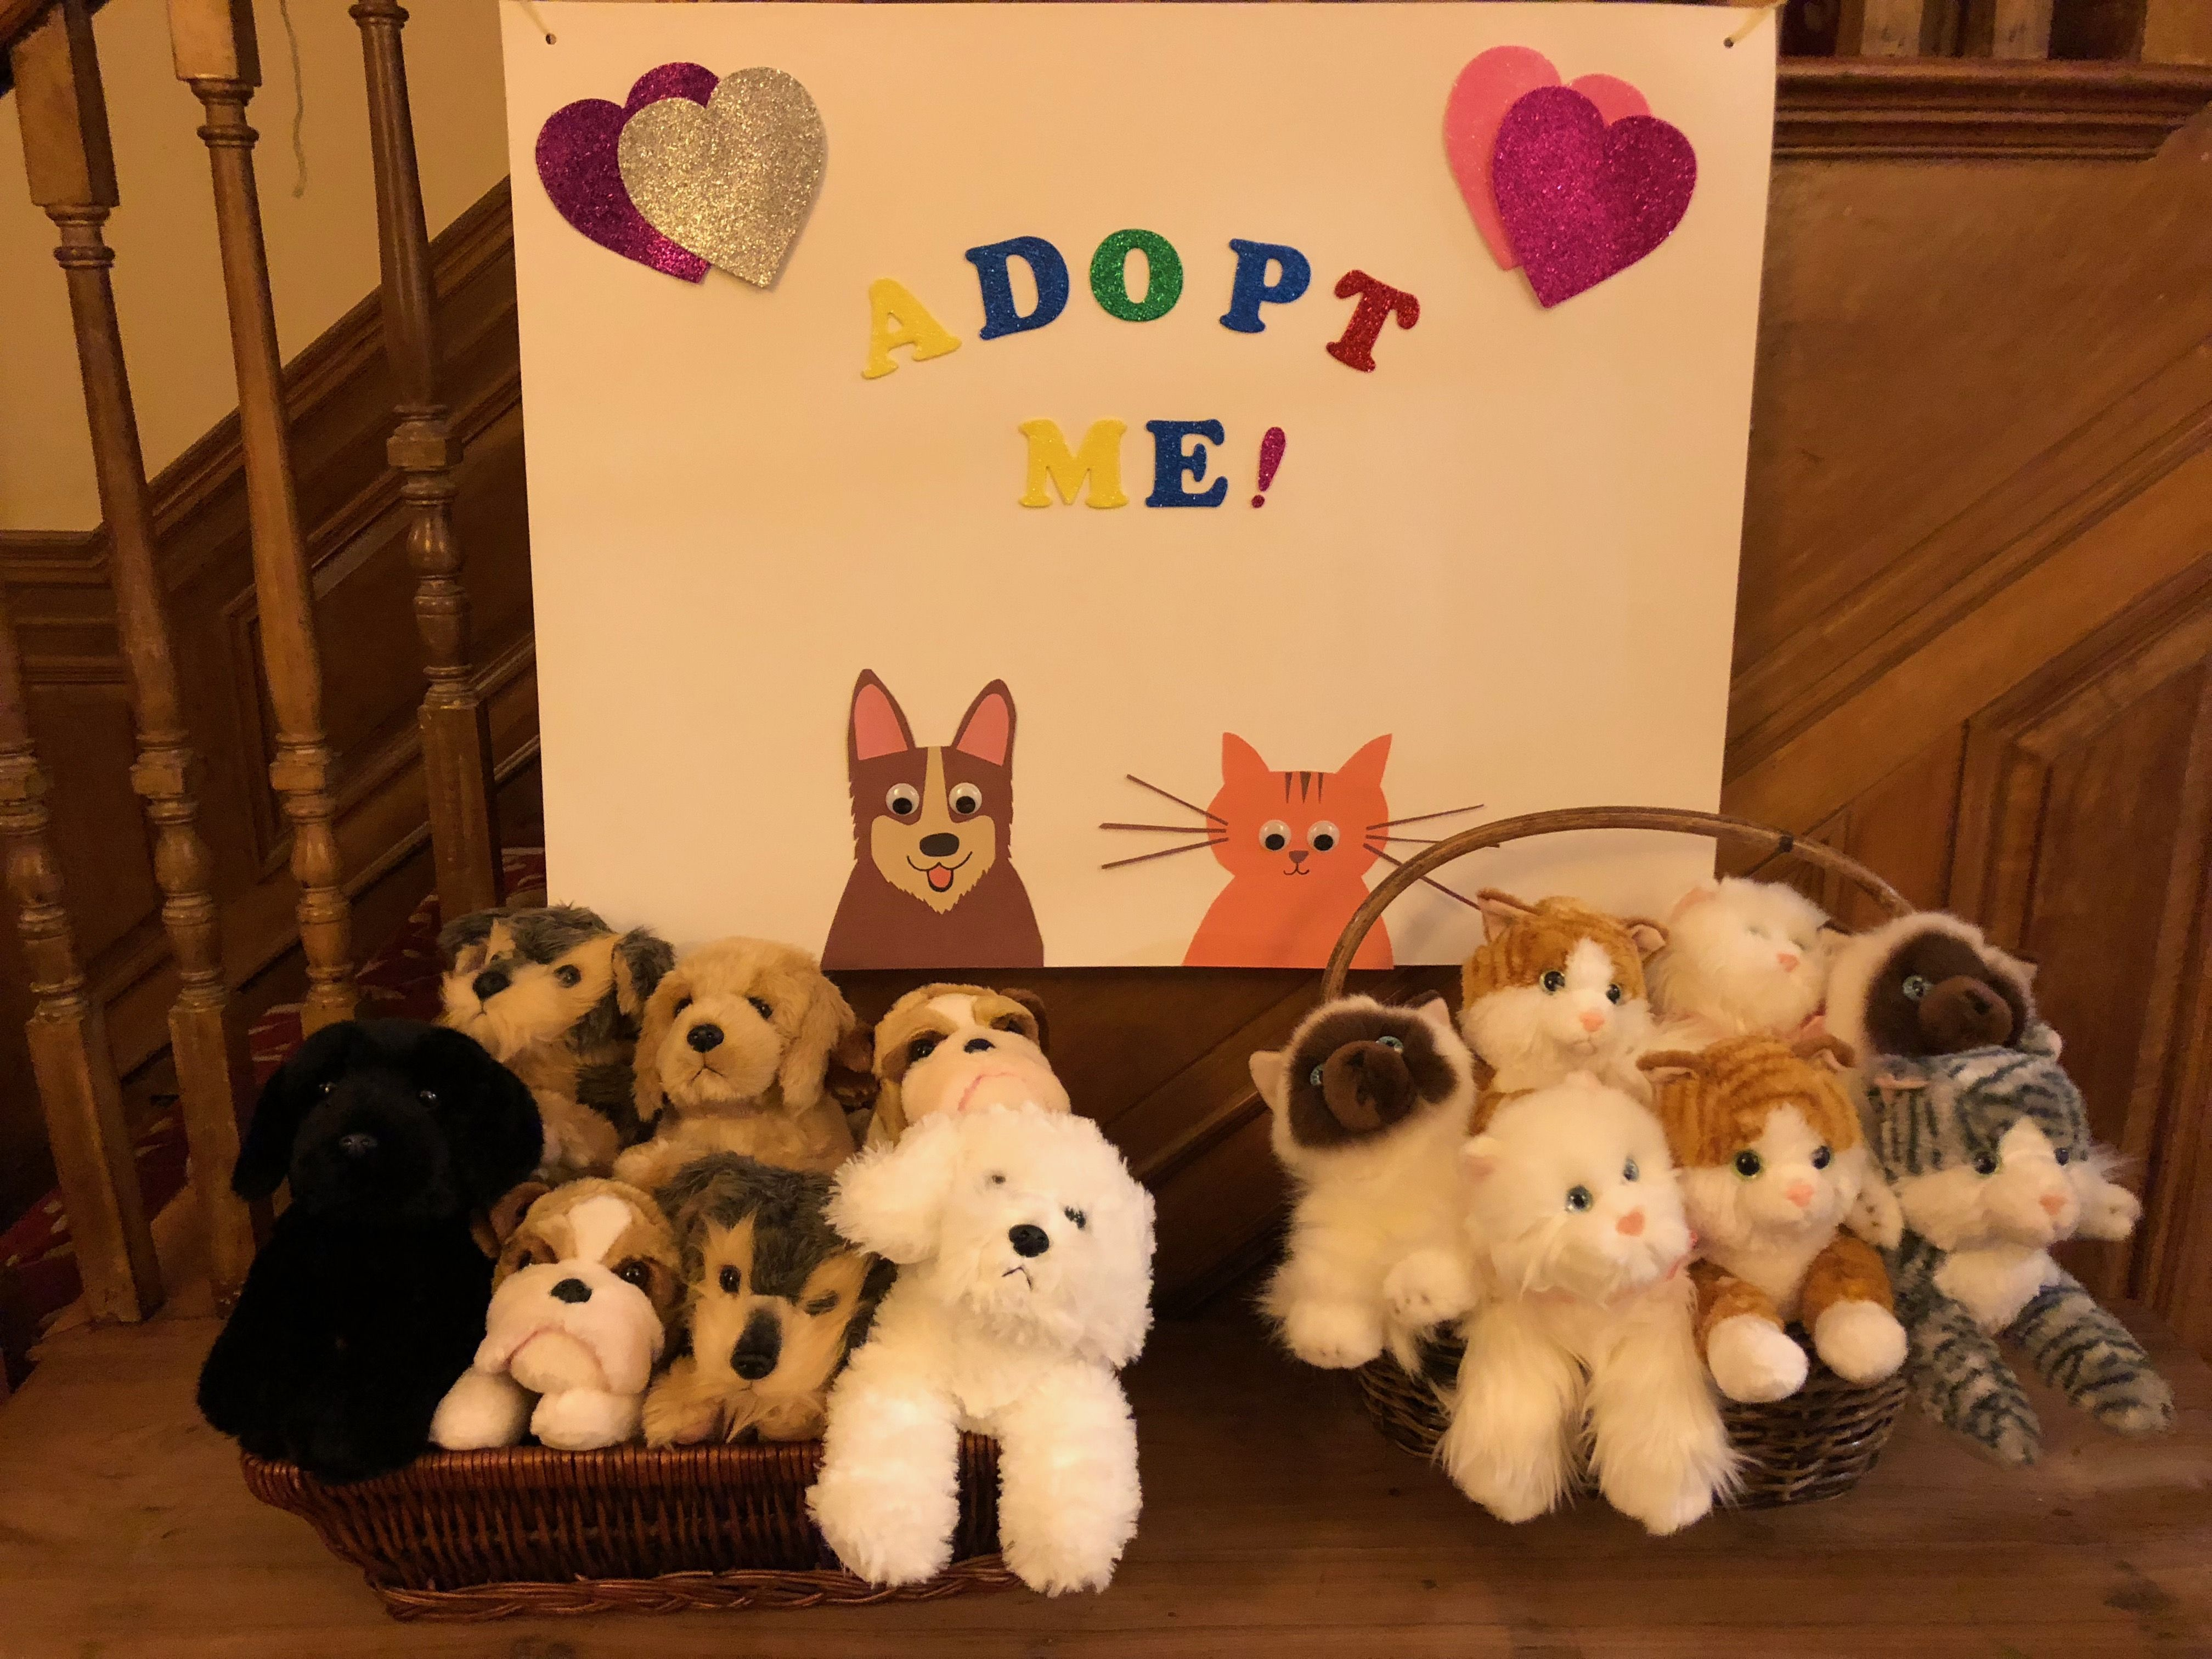 Puppy And Kitten Adoption Center At Kid S Birthday Party Kitten Adoption Kittens Dog Adoption